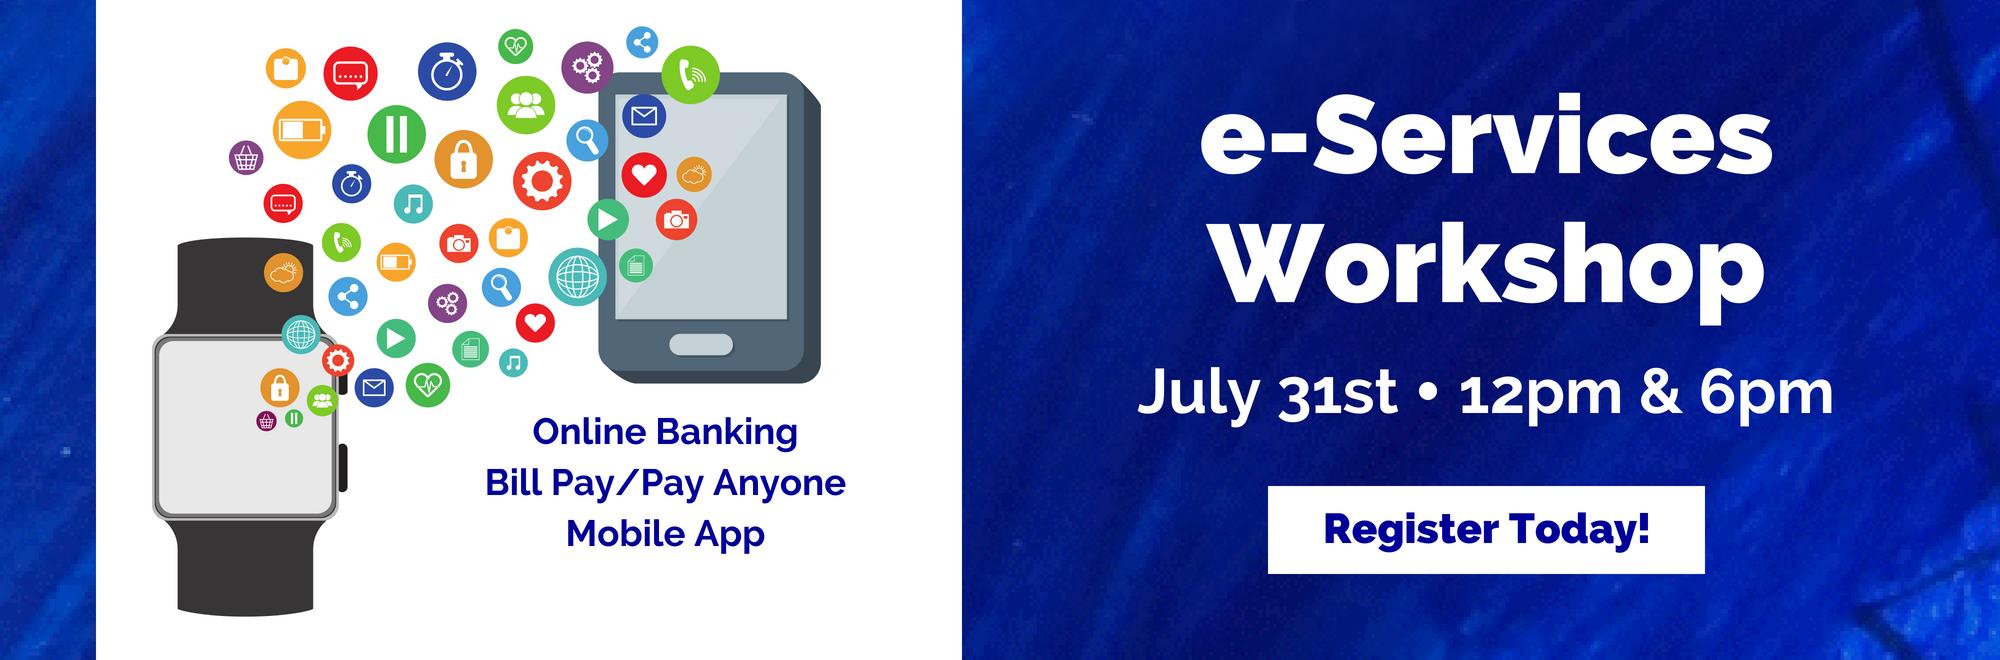 e-Services Workshop-Register Today!